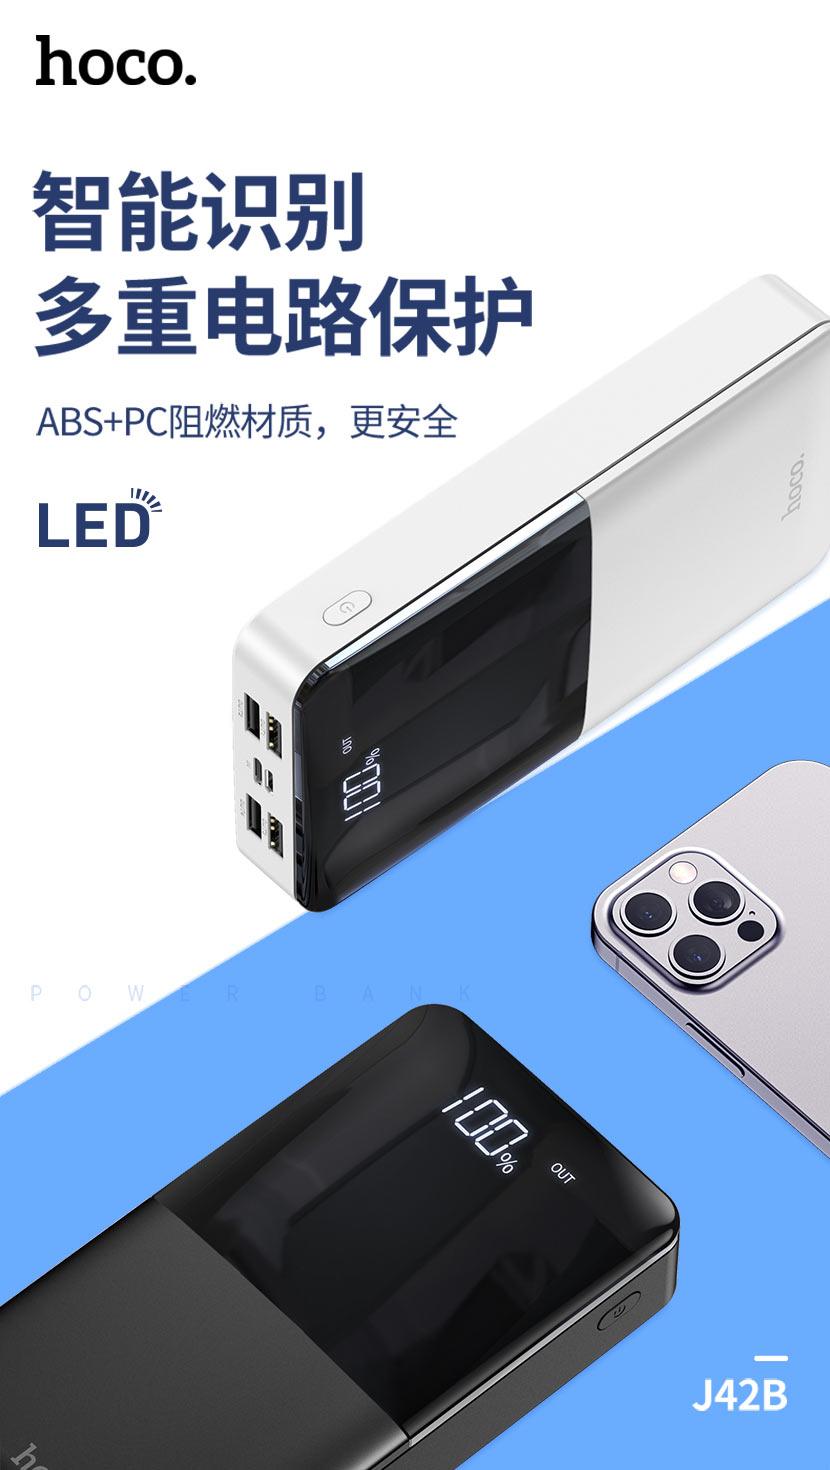 hoco news j42b high power mobile power bank 30000mah protection cn